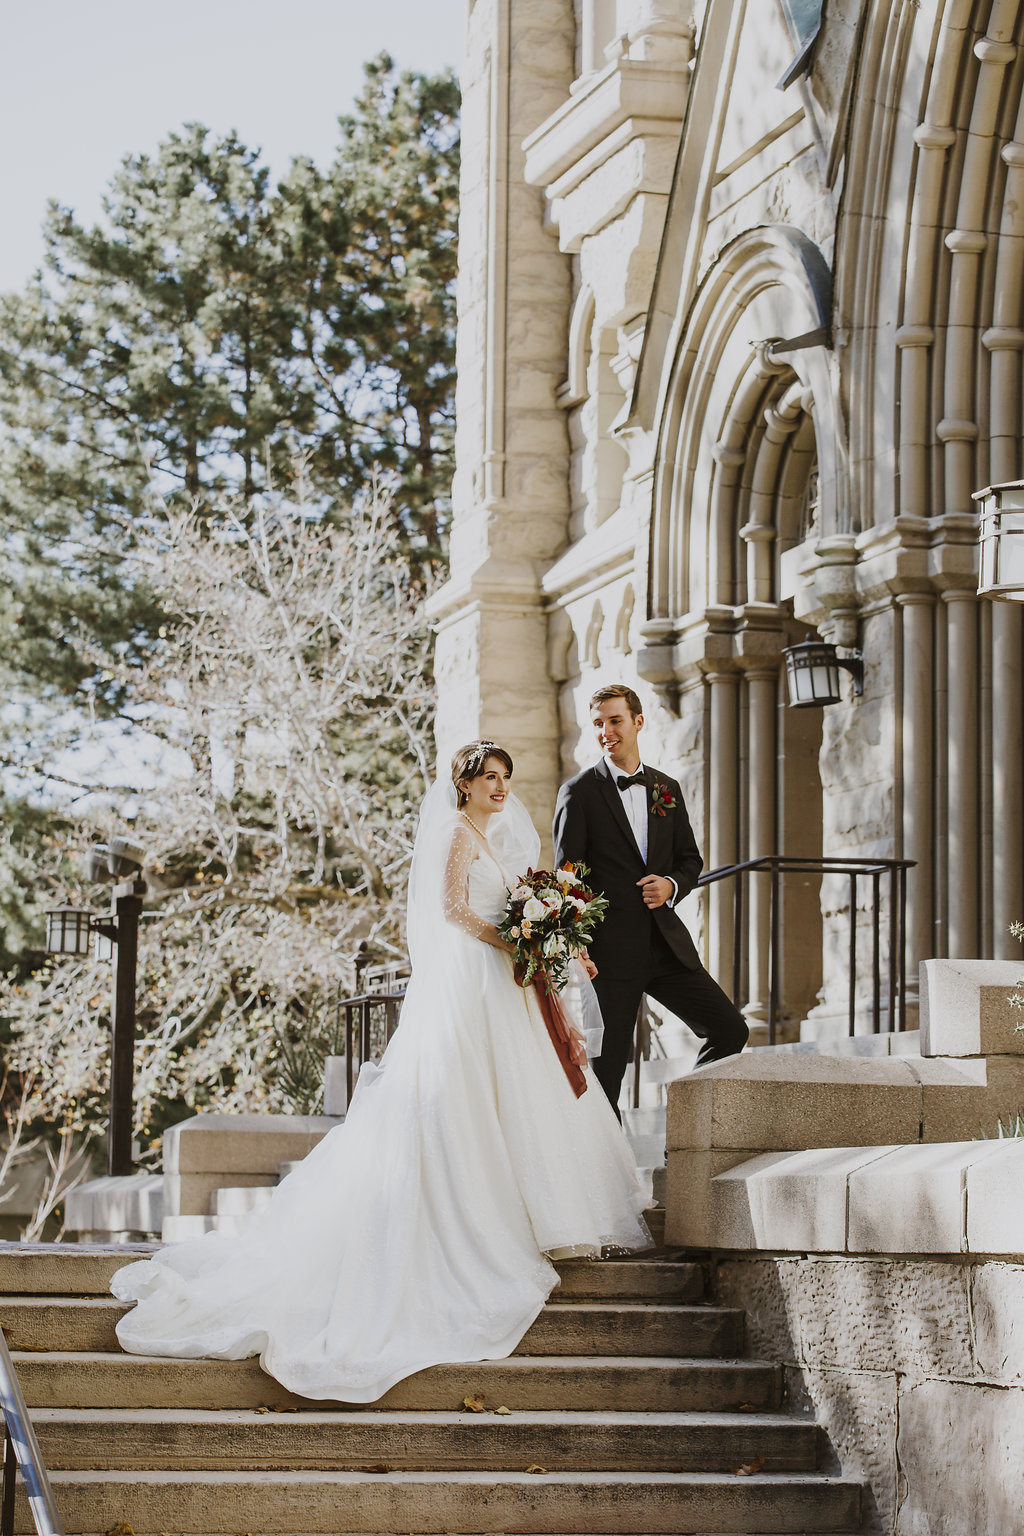 Catholic Wedding | Fall Wedding | Salt Lake City Wedding | Country Club Wedding | Burgundy | Michelle Leo Events | Utah Wedding Design and Planning | Grey Giraffe Photography